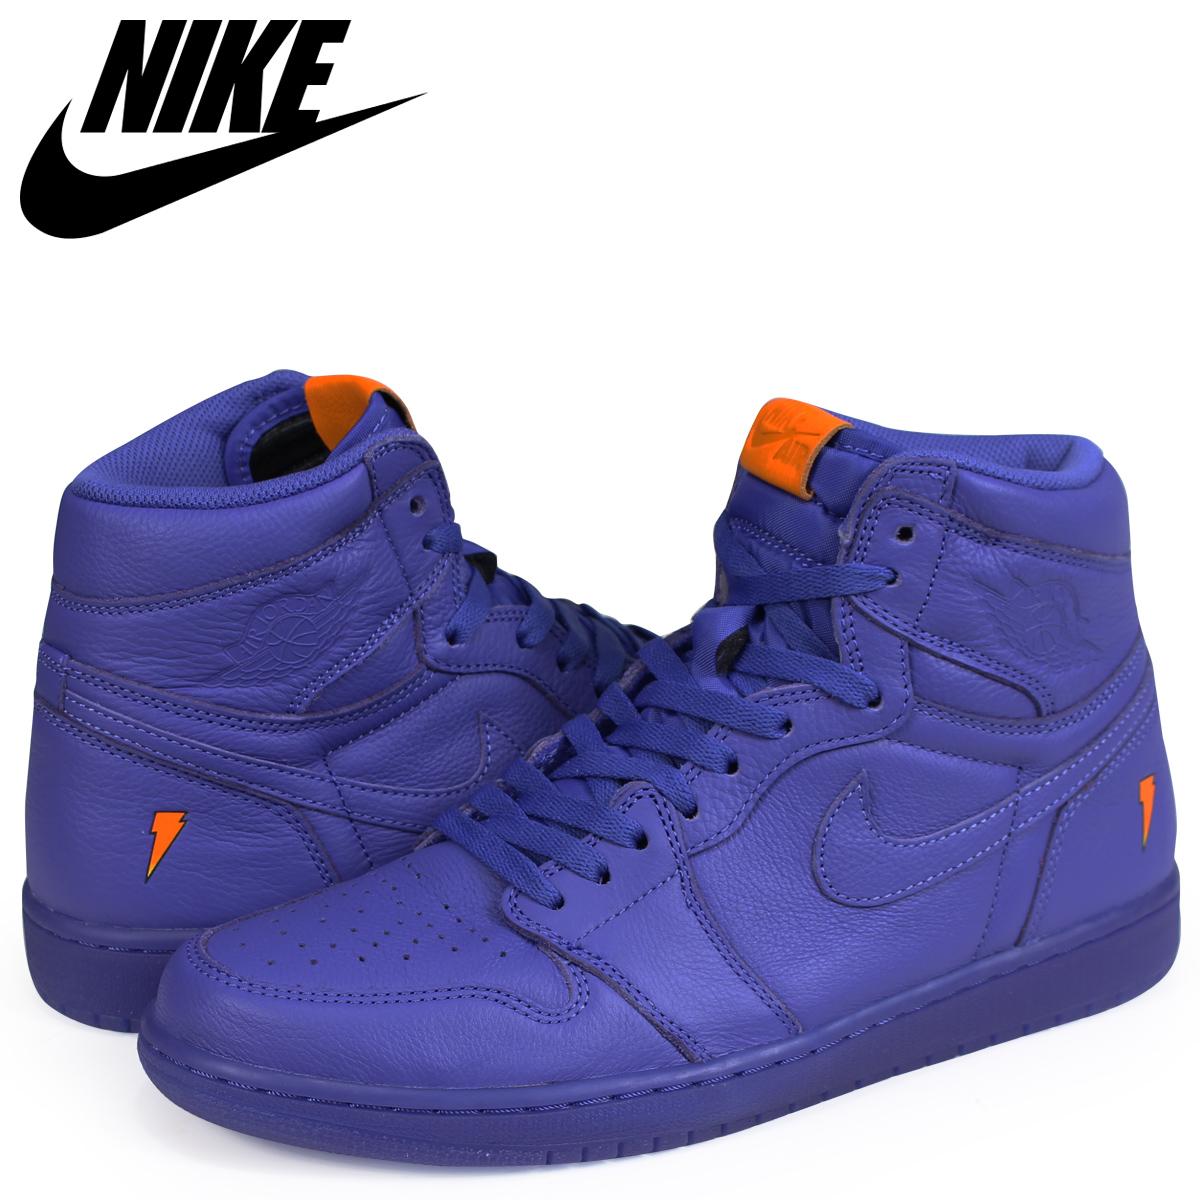 the latest 1cdb8 82b8b NIKE AIR JORDAN 1 RETRO HIGH OG G8RD BE LIKE MIKE GRAPE Nike Air Jordan 1  nostalgic high sneakers men AJ5997-555 blue